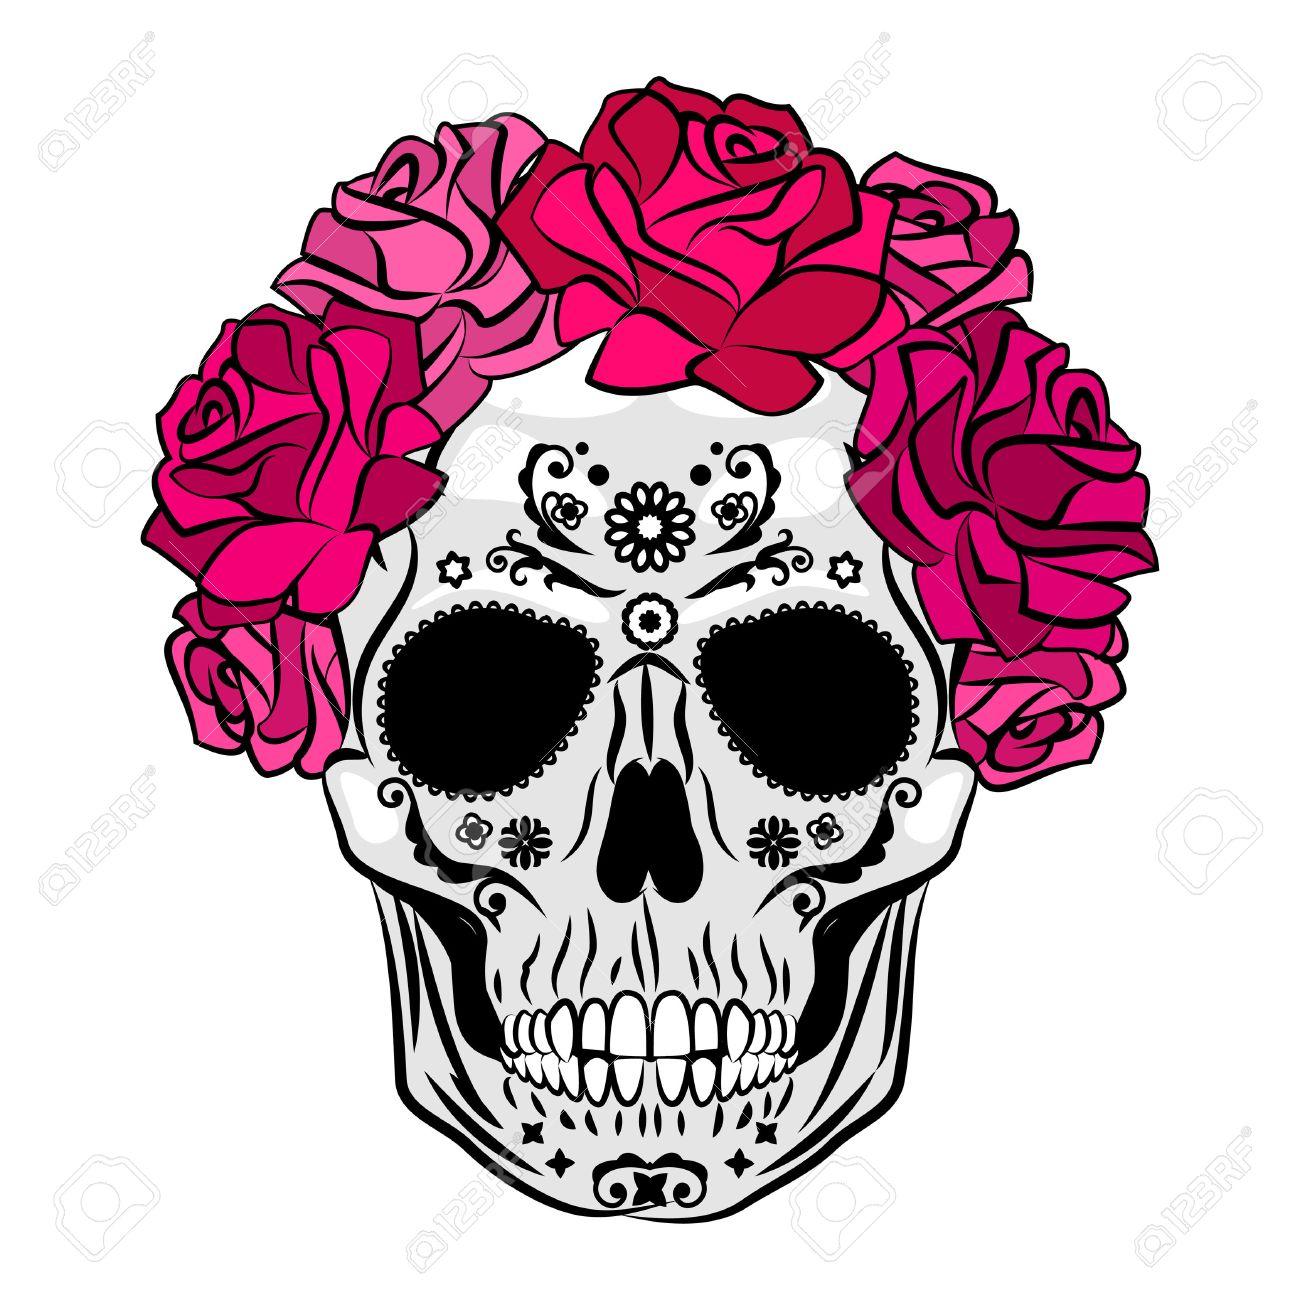 human skull with makeup mexican catrina skull makeup senorita rh 123rf com vector cardinal victor catering israel